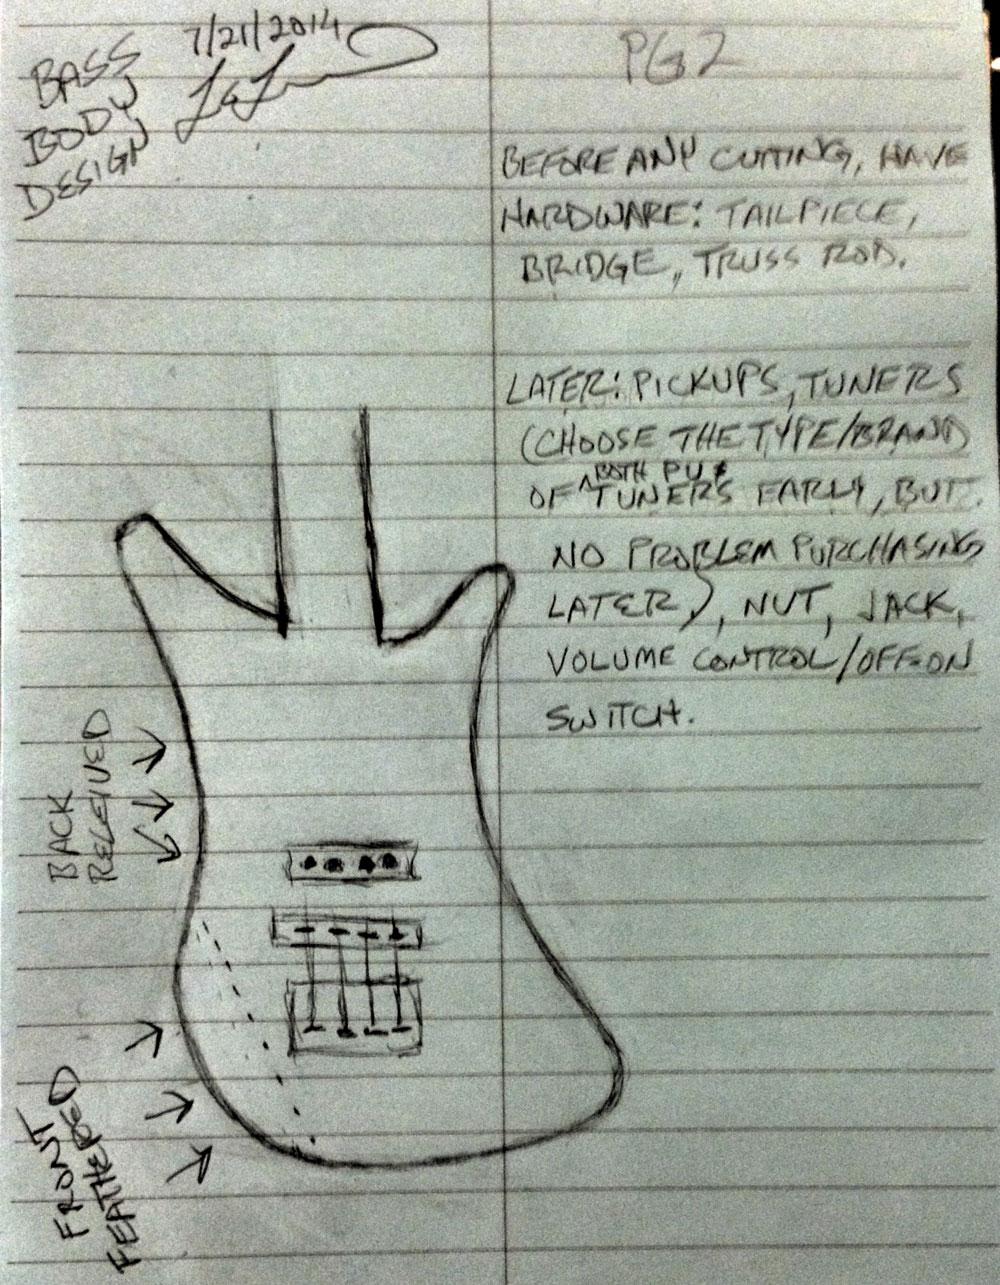 Drawn guitar paper Lee Electric shadows Considerations Drawn